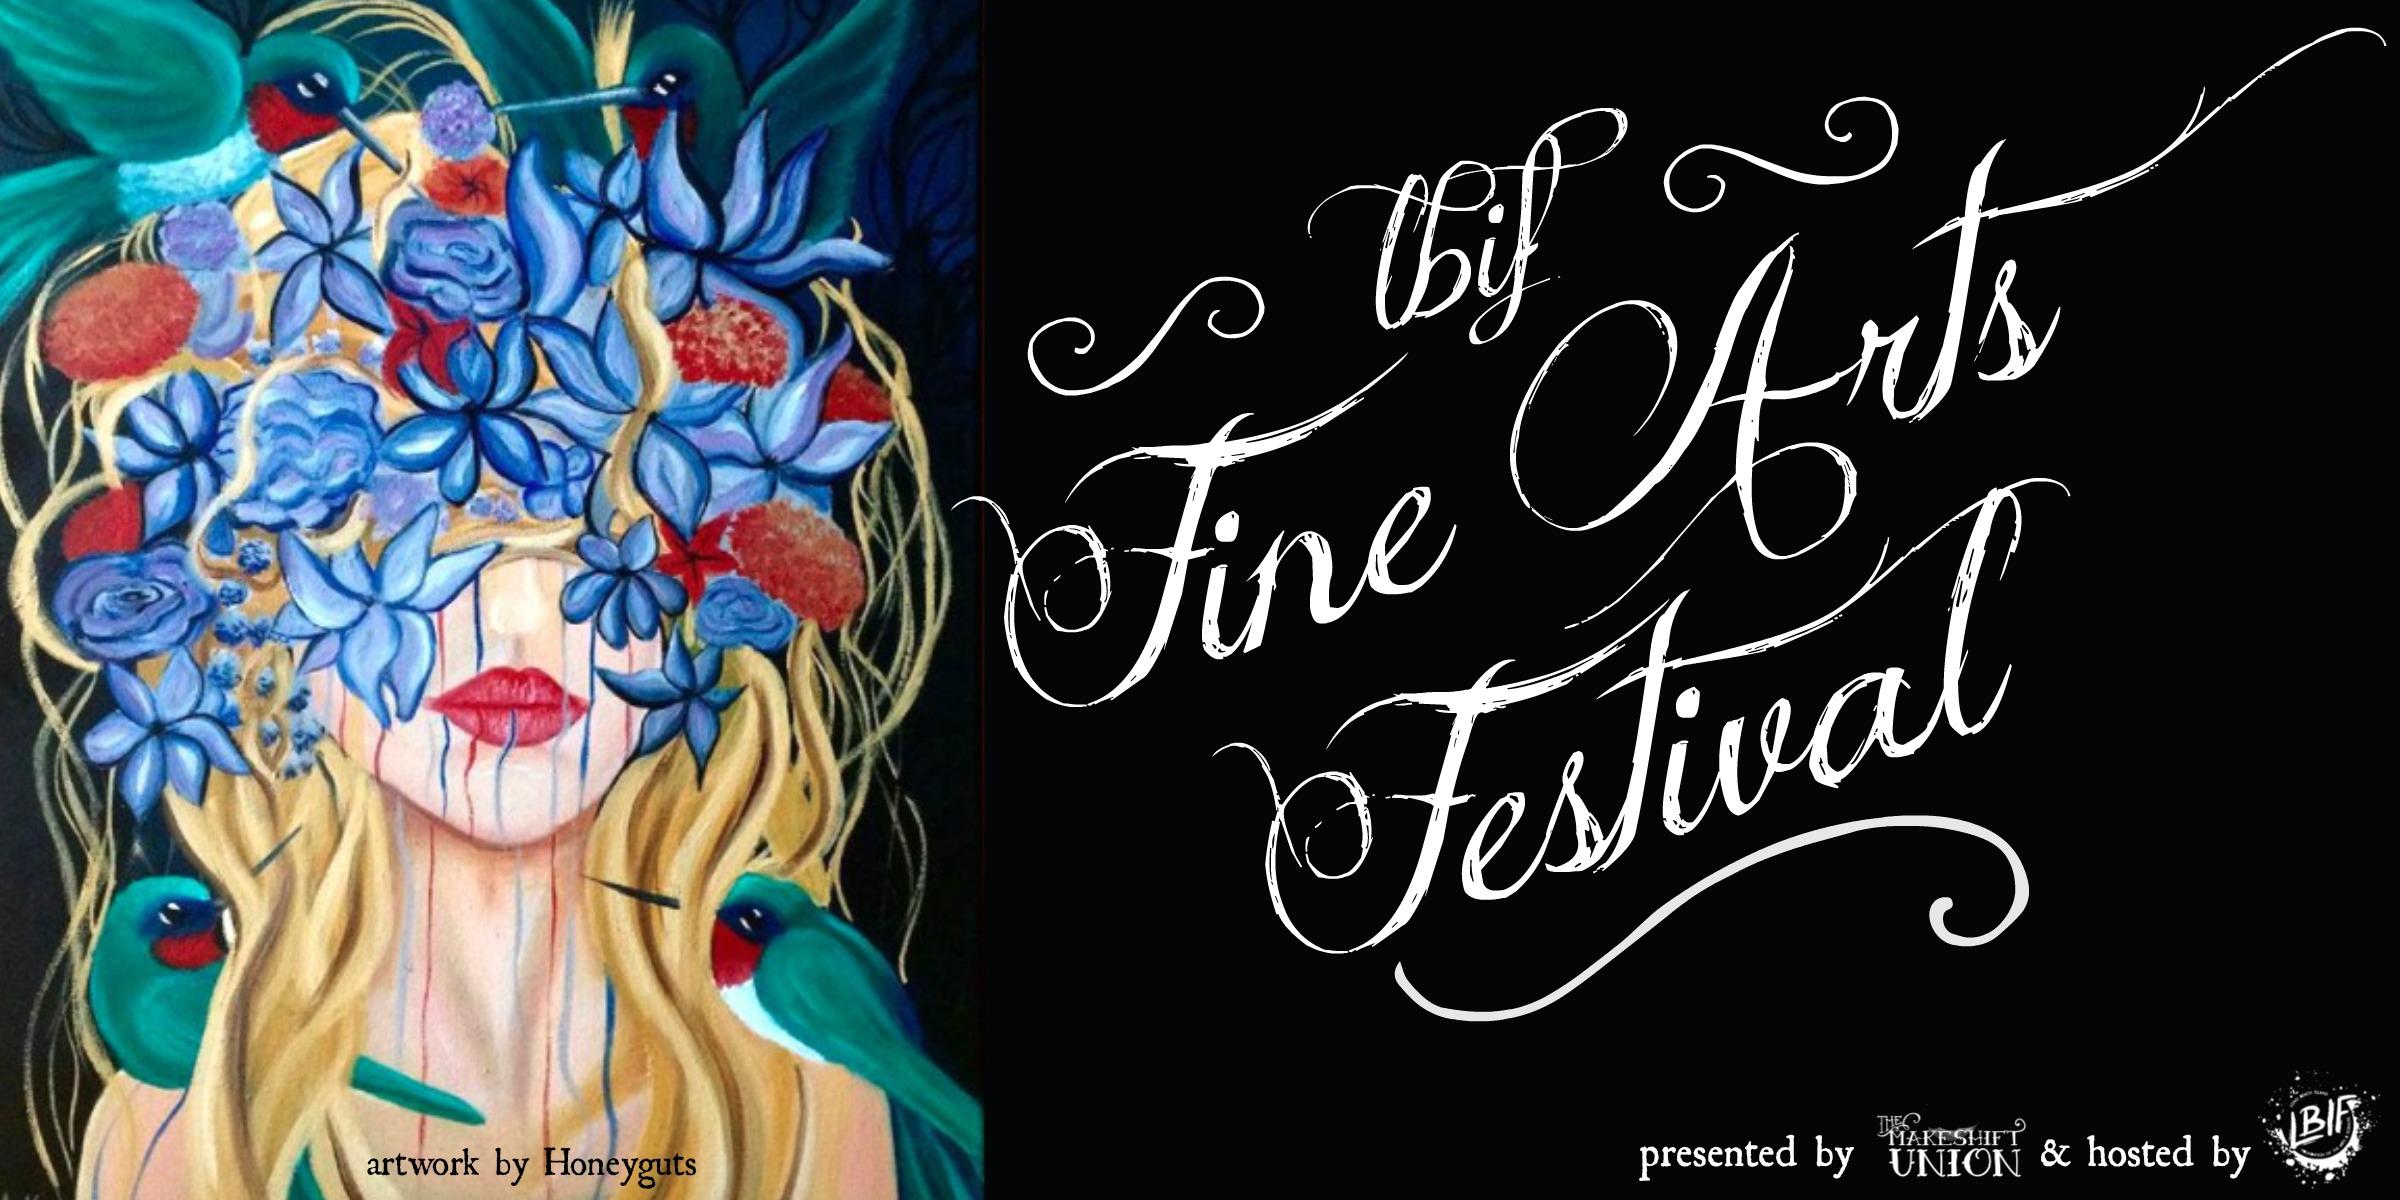 LBIF Fine Arts Festival July 21, 2019